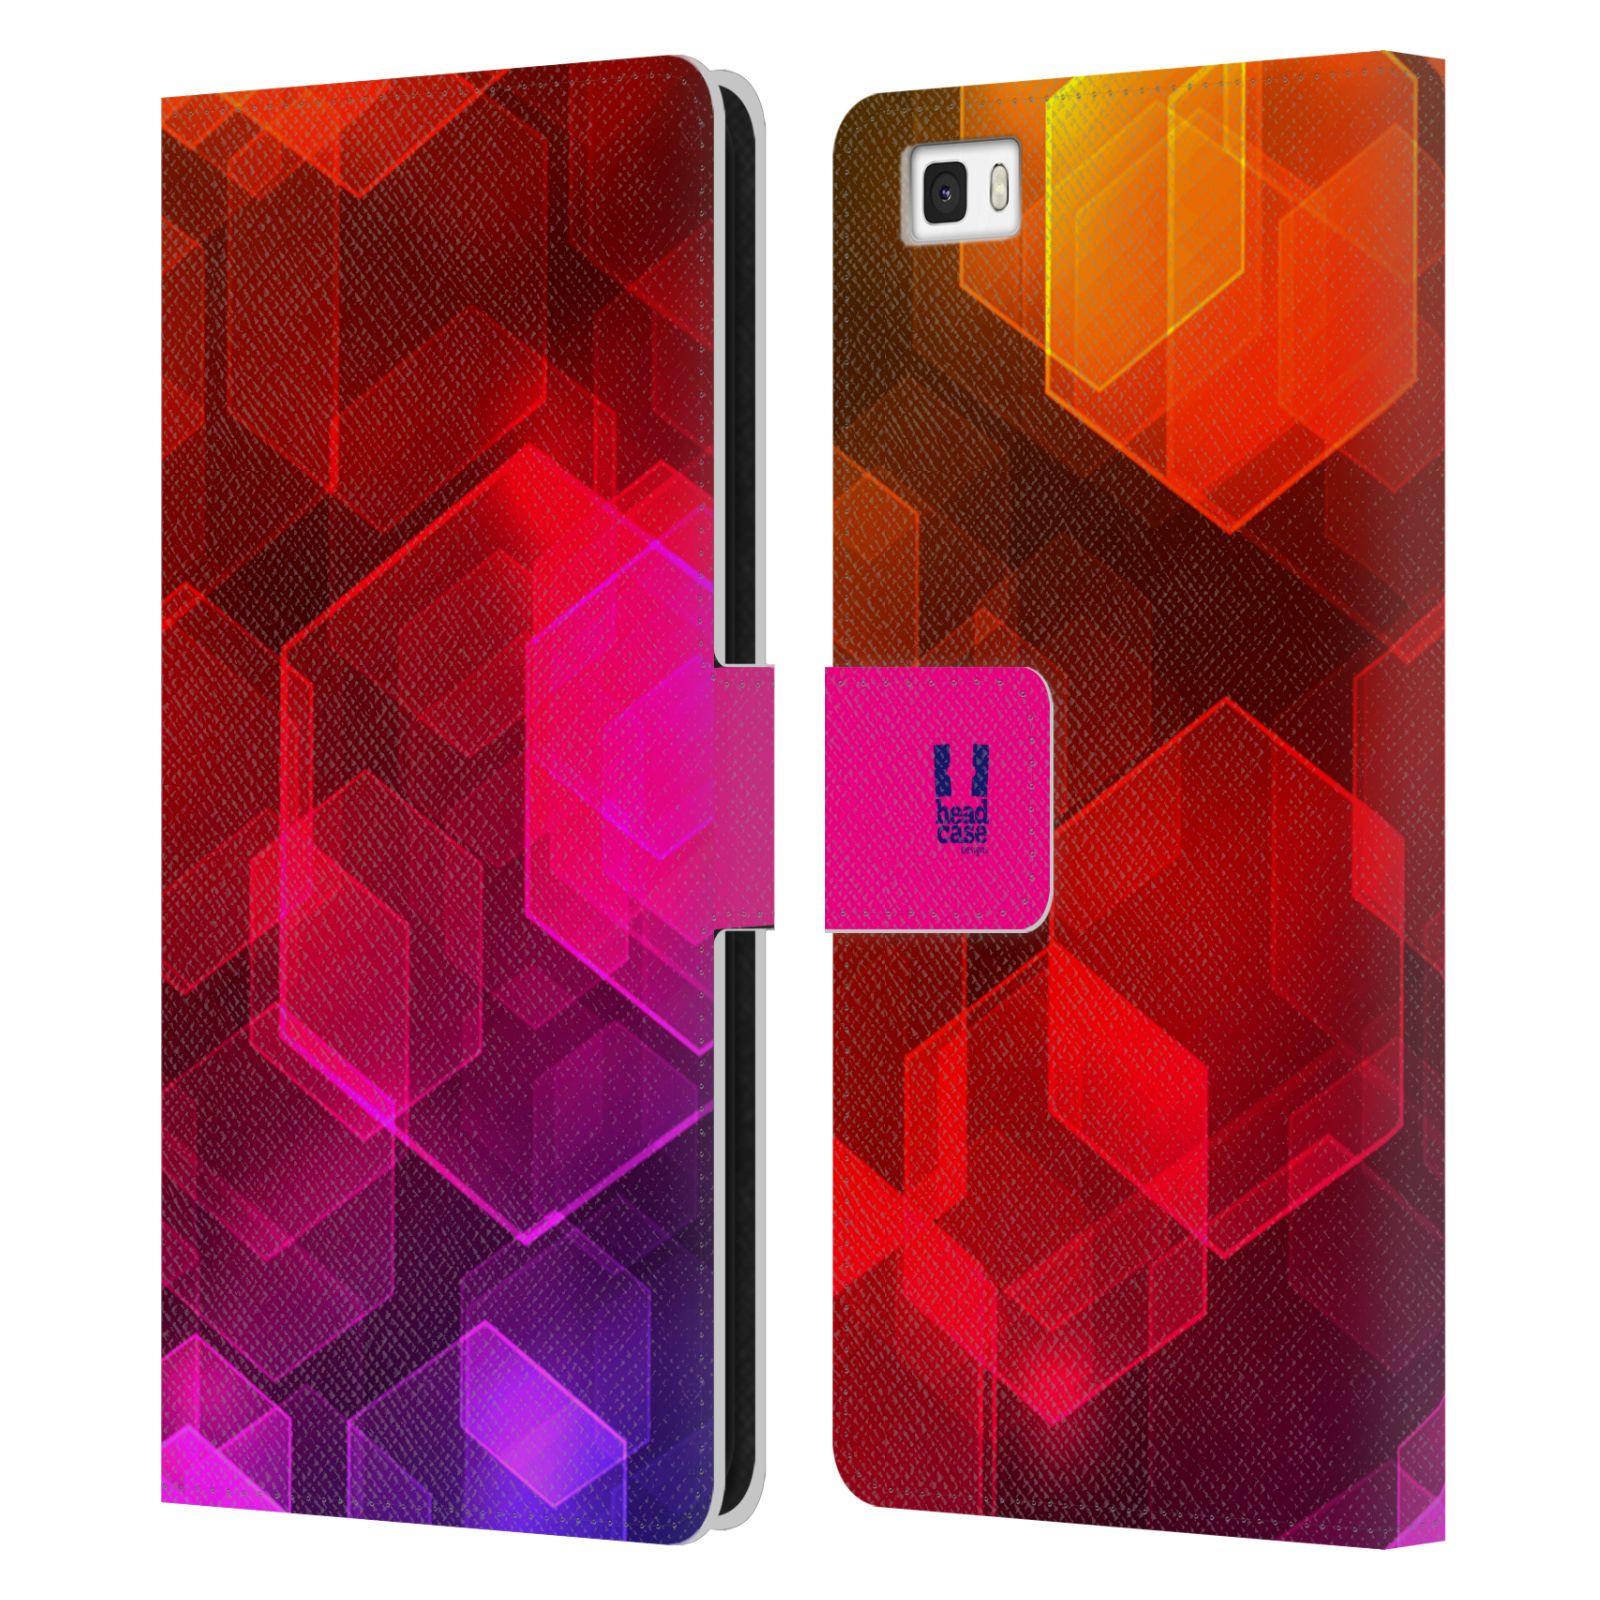 HEAD CASE Flipové pouzdro pro mobil Huawei P8 LITE BOKEH zářící vzor hexagon růžová